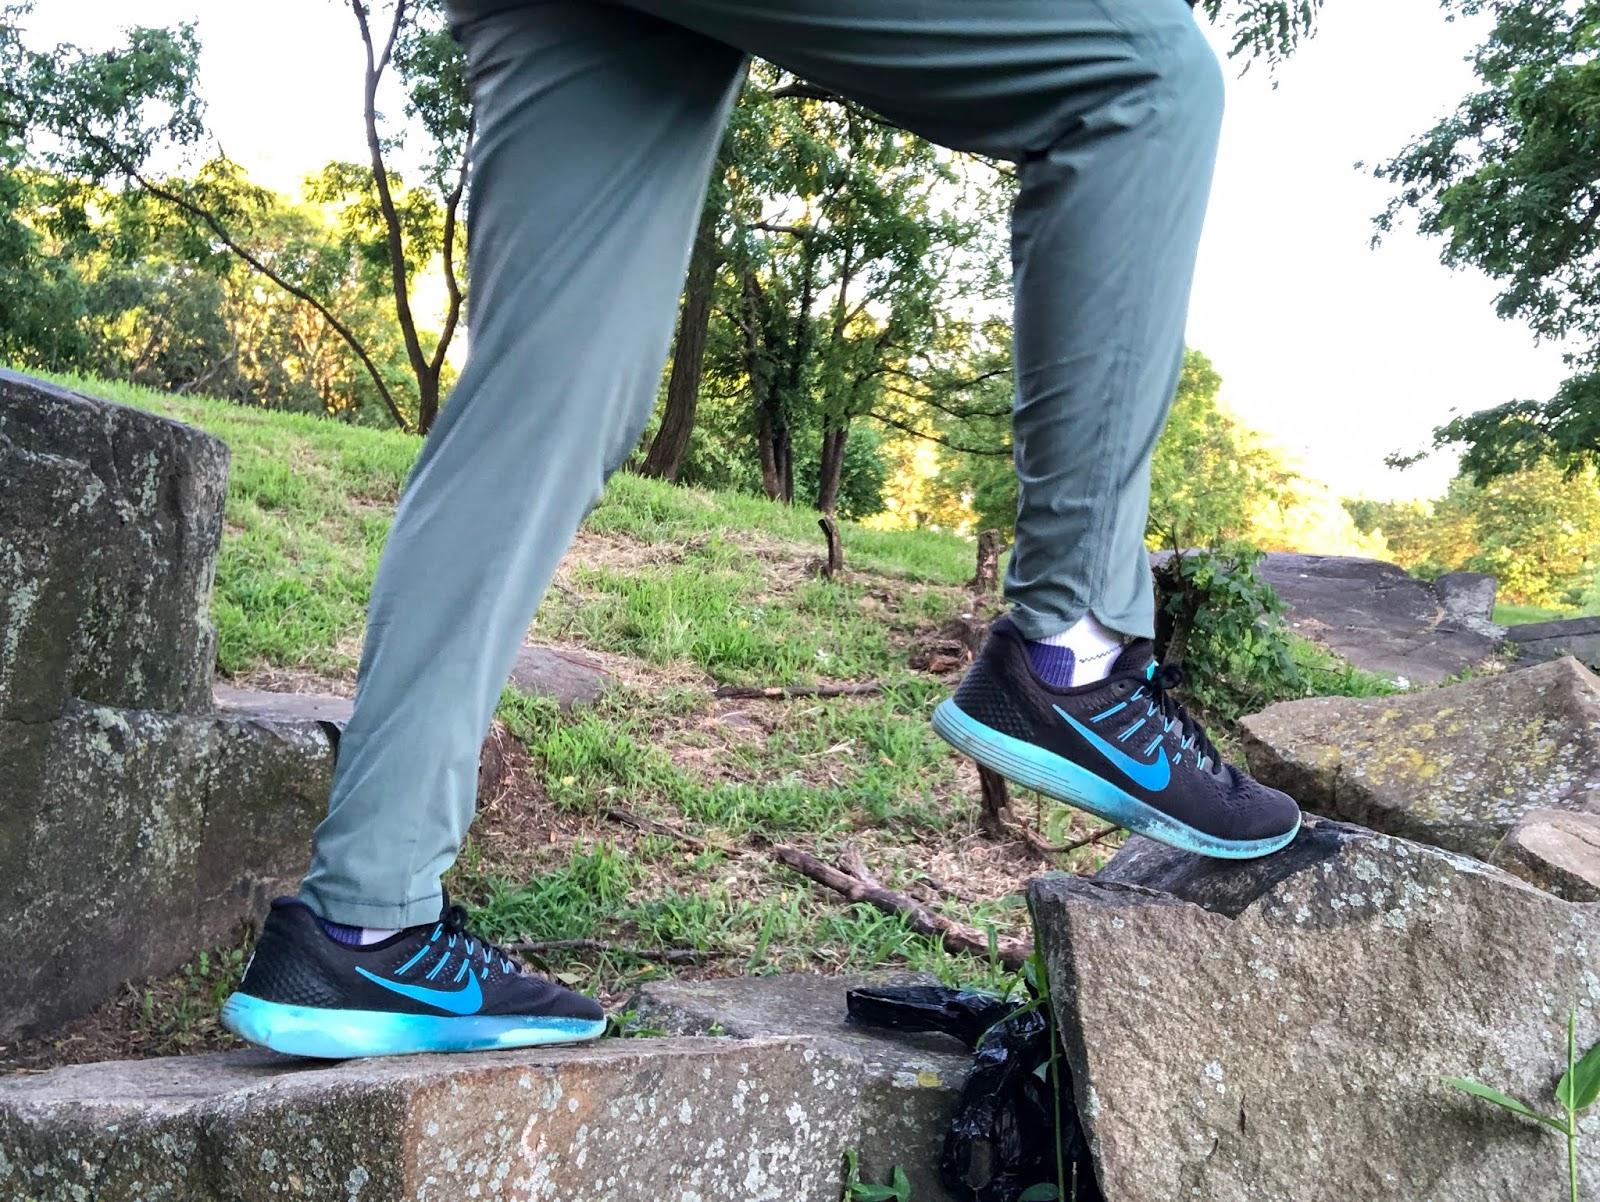 Sahara stepping in blue nike sneakers